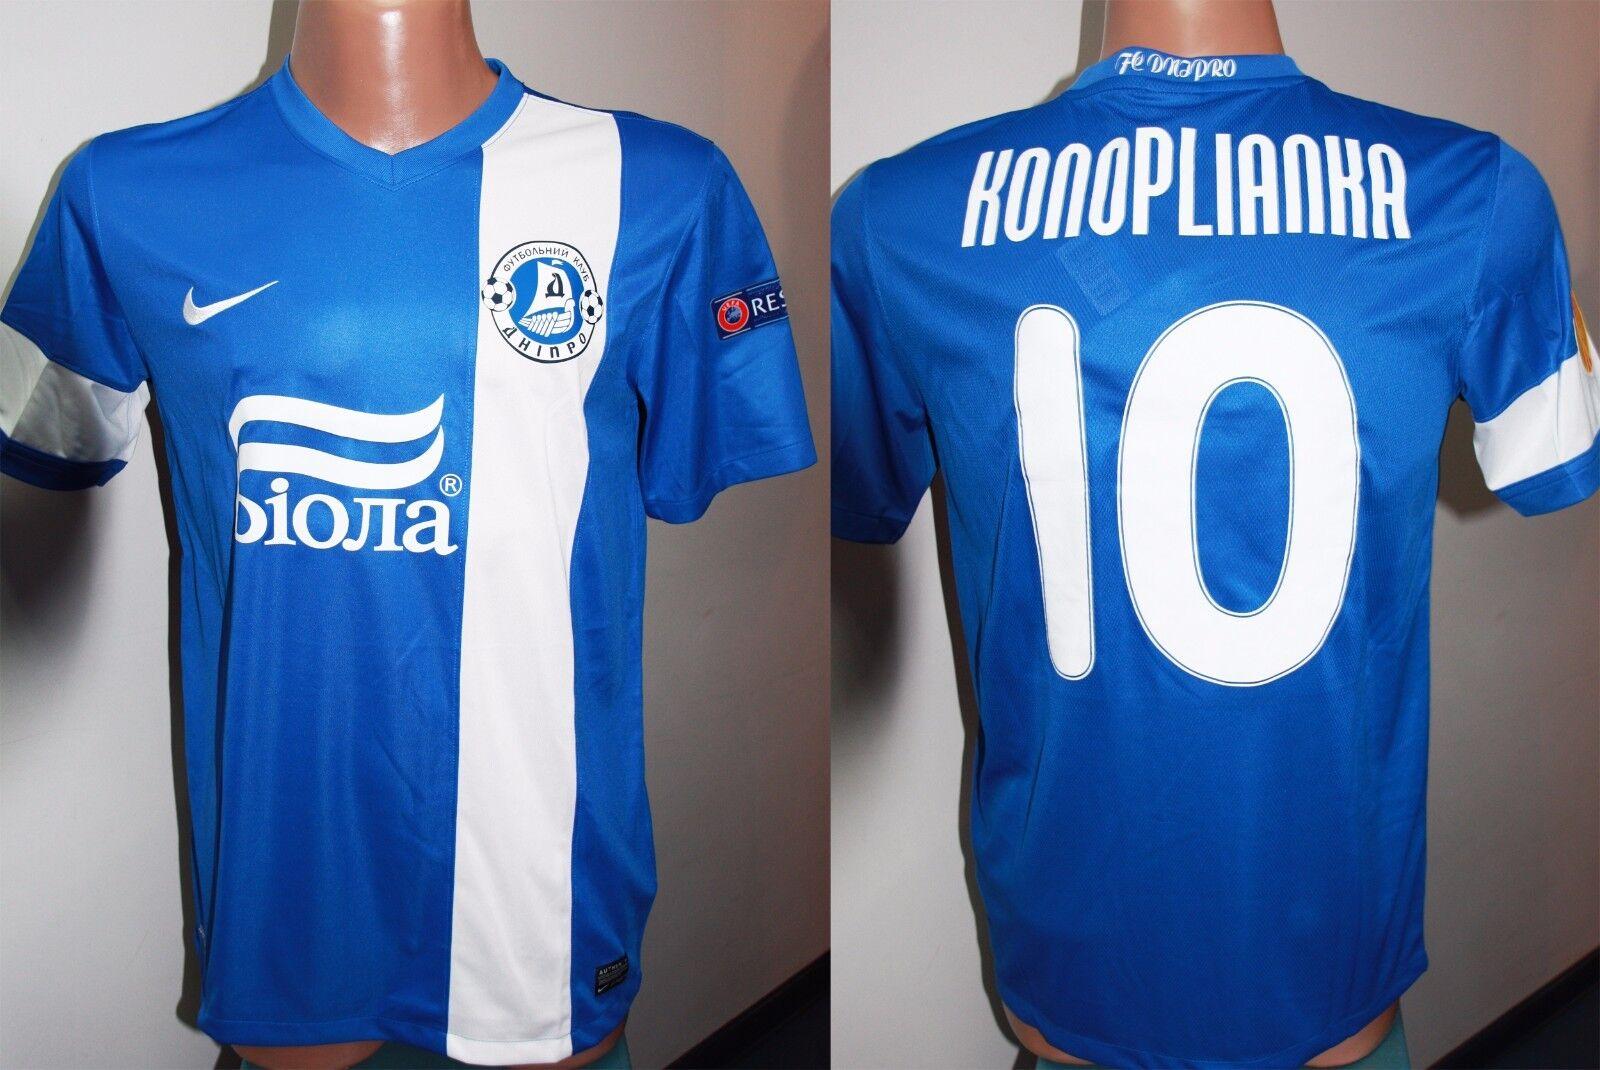 SHIRT FC Dnipro KONOPLIANKA KONOPLYANKA Schalke 04 MATCH WORN JERSEY JERSEY JERSEY 2013 14  | Stilvoll und lustig  fa19dc